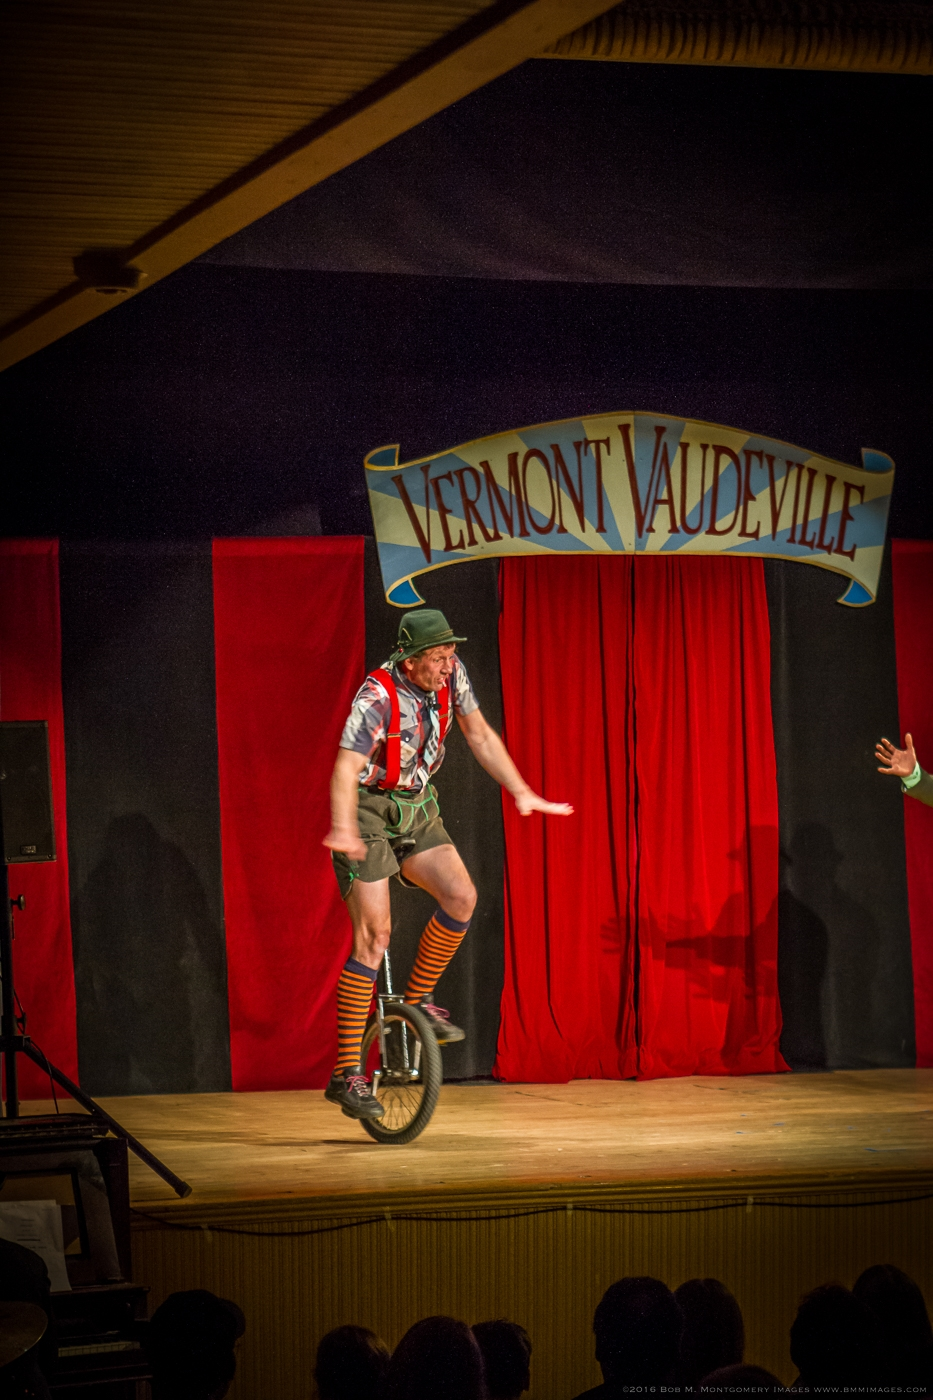 Vermont Vaudeville 20160513 - 0035.jpg